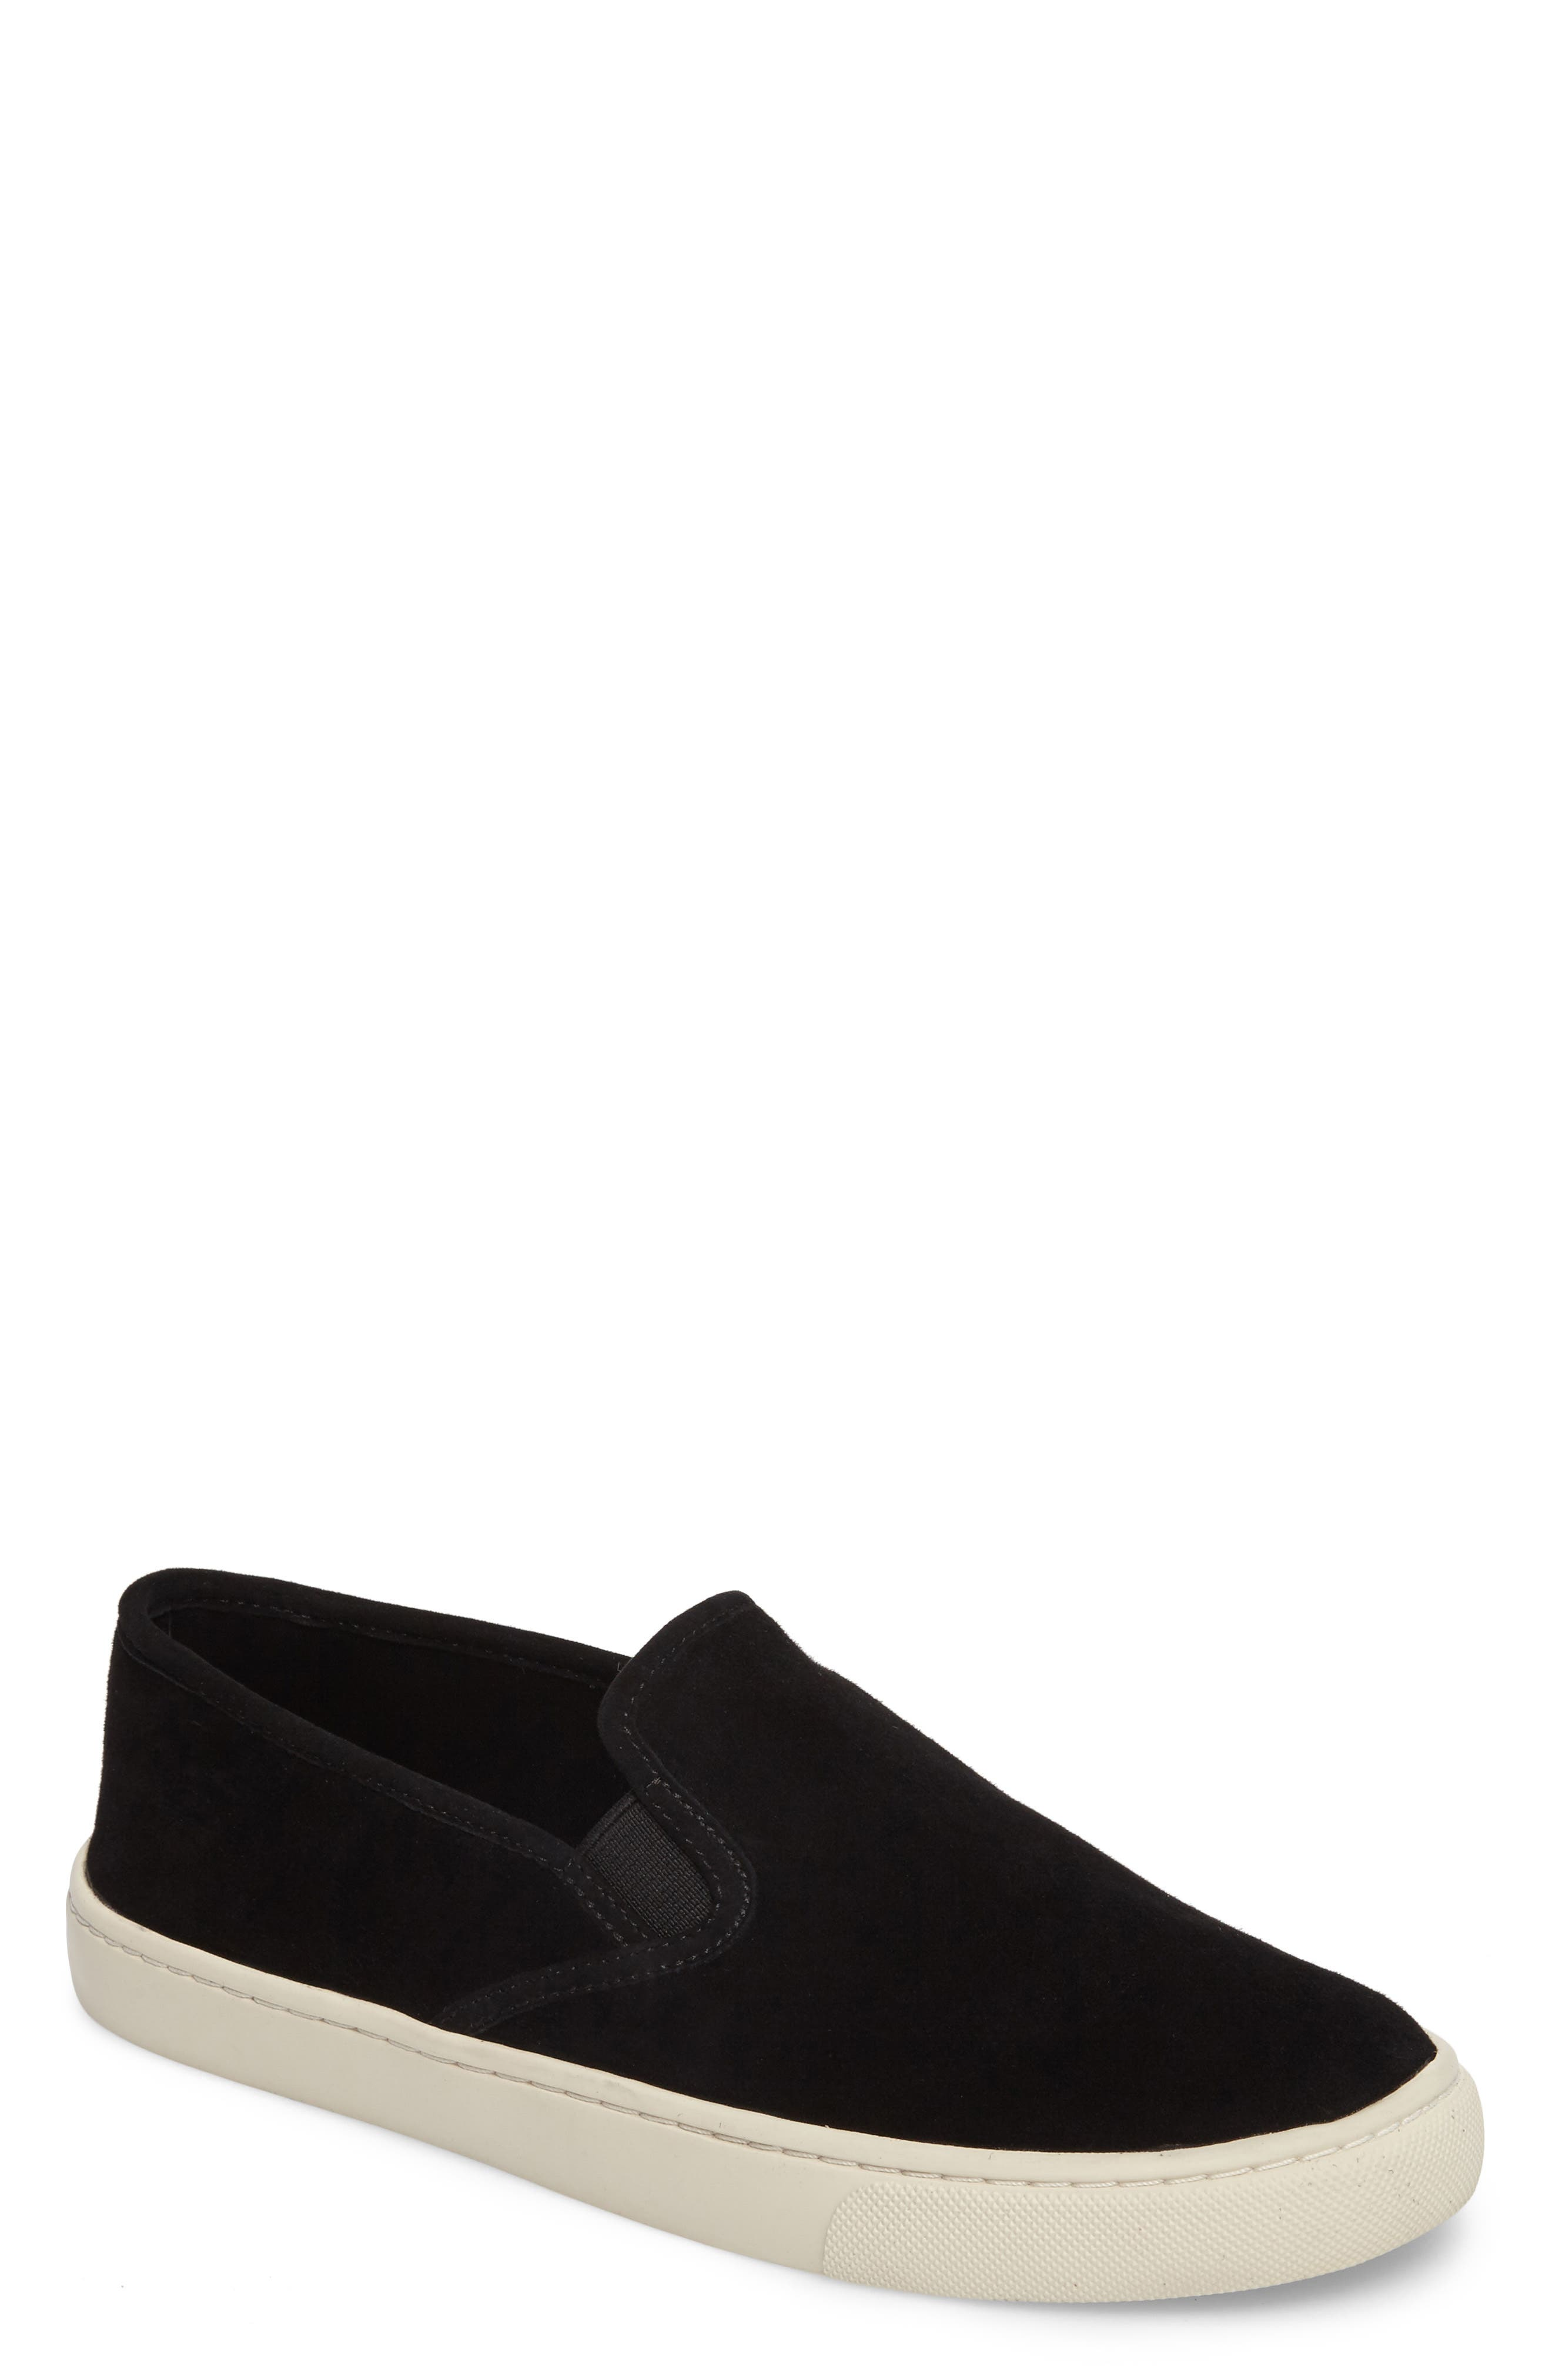 Max Slip-On Sneaker,                         Main,                         color,